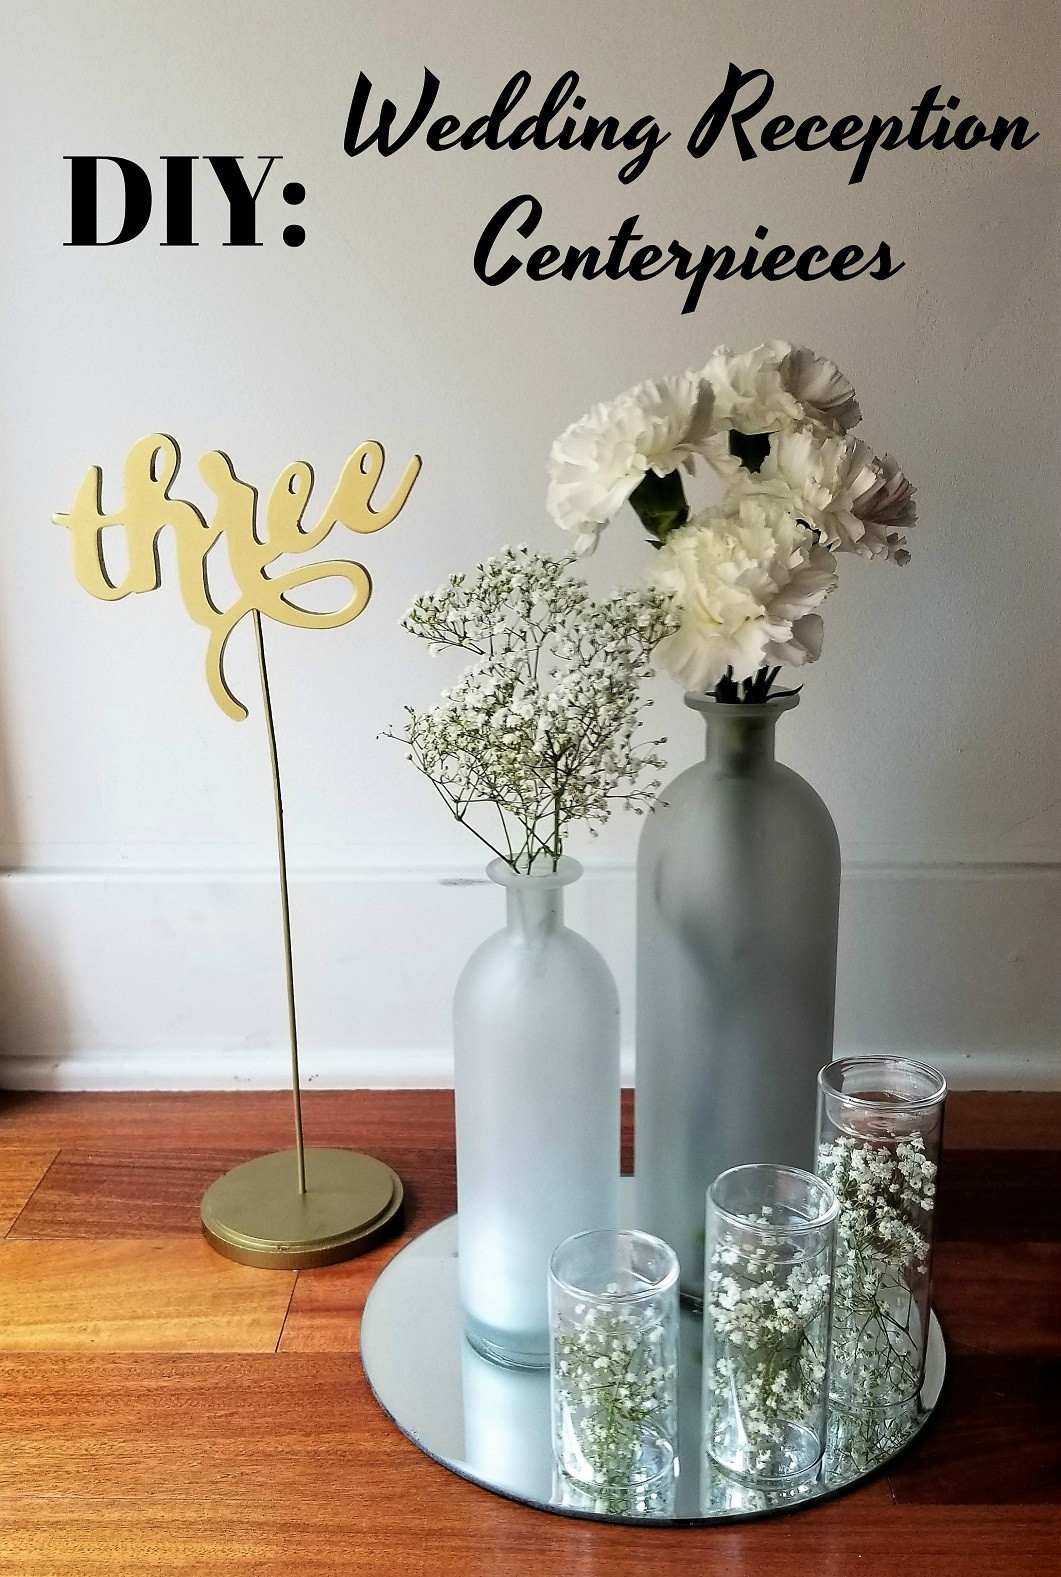 Best ideas about DIY Centerpieces For Wedding Receptions . Save or Pin DIY Inexpensive Wedding Reception Centerpieces La Vie en Now.